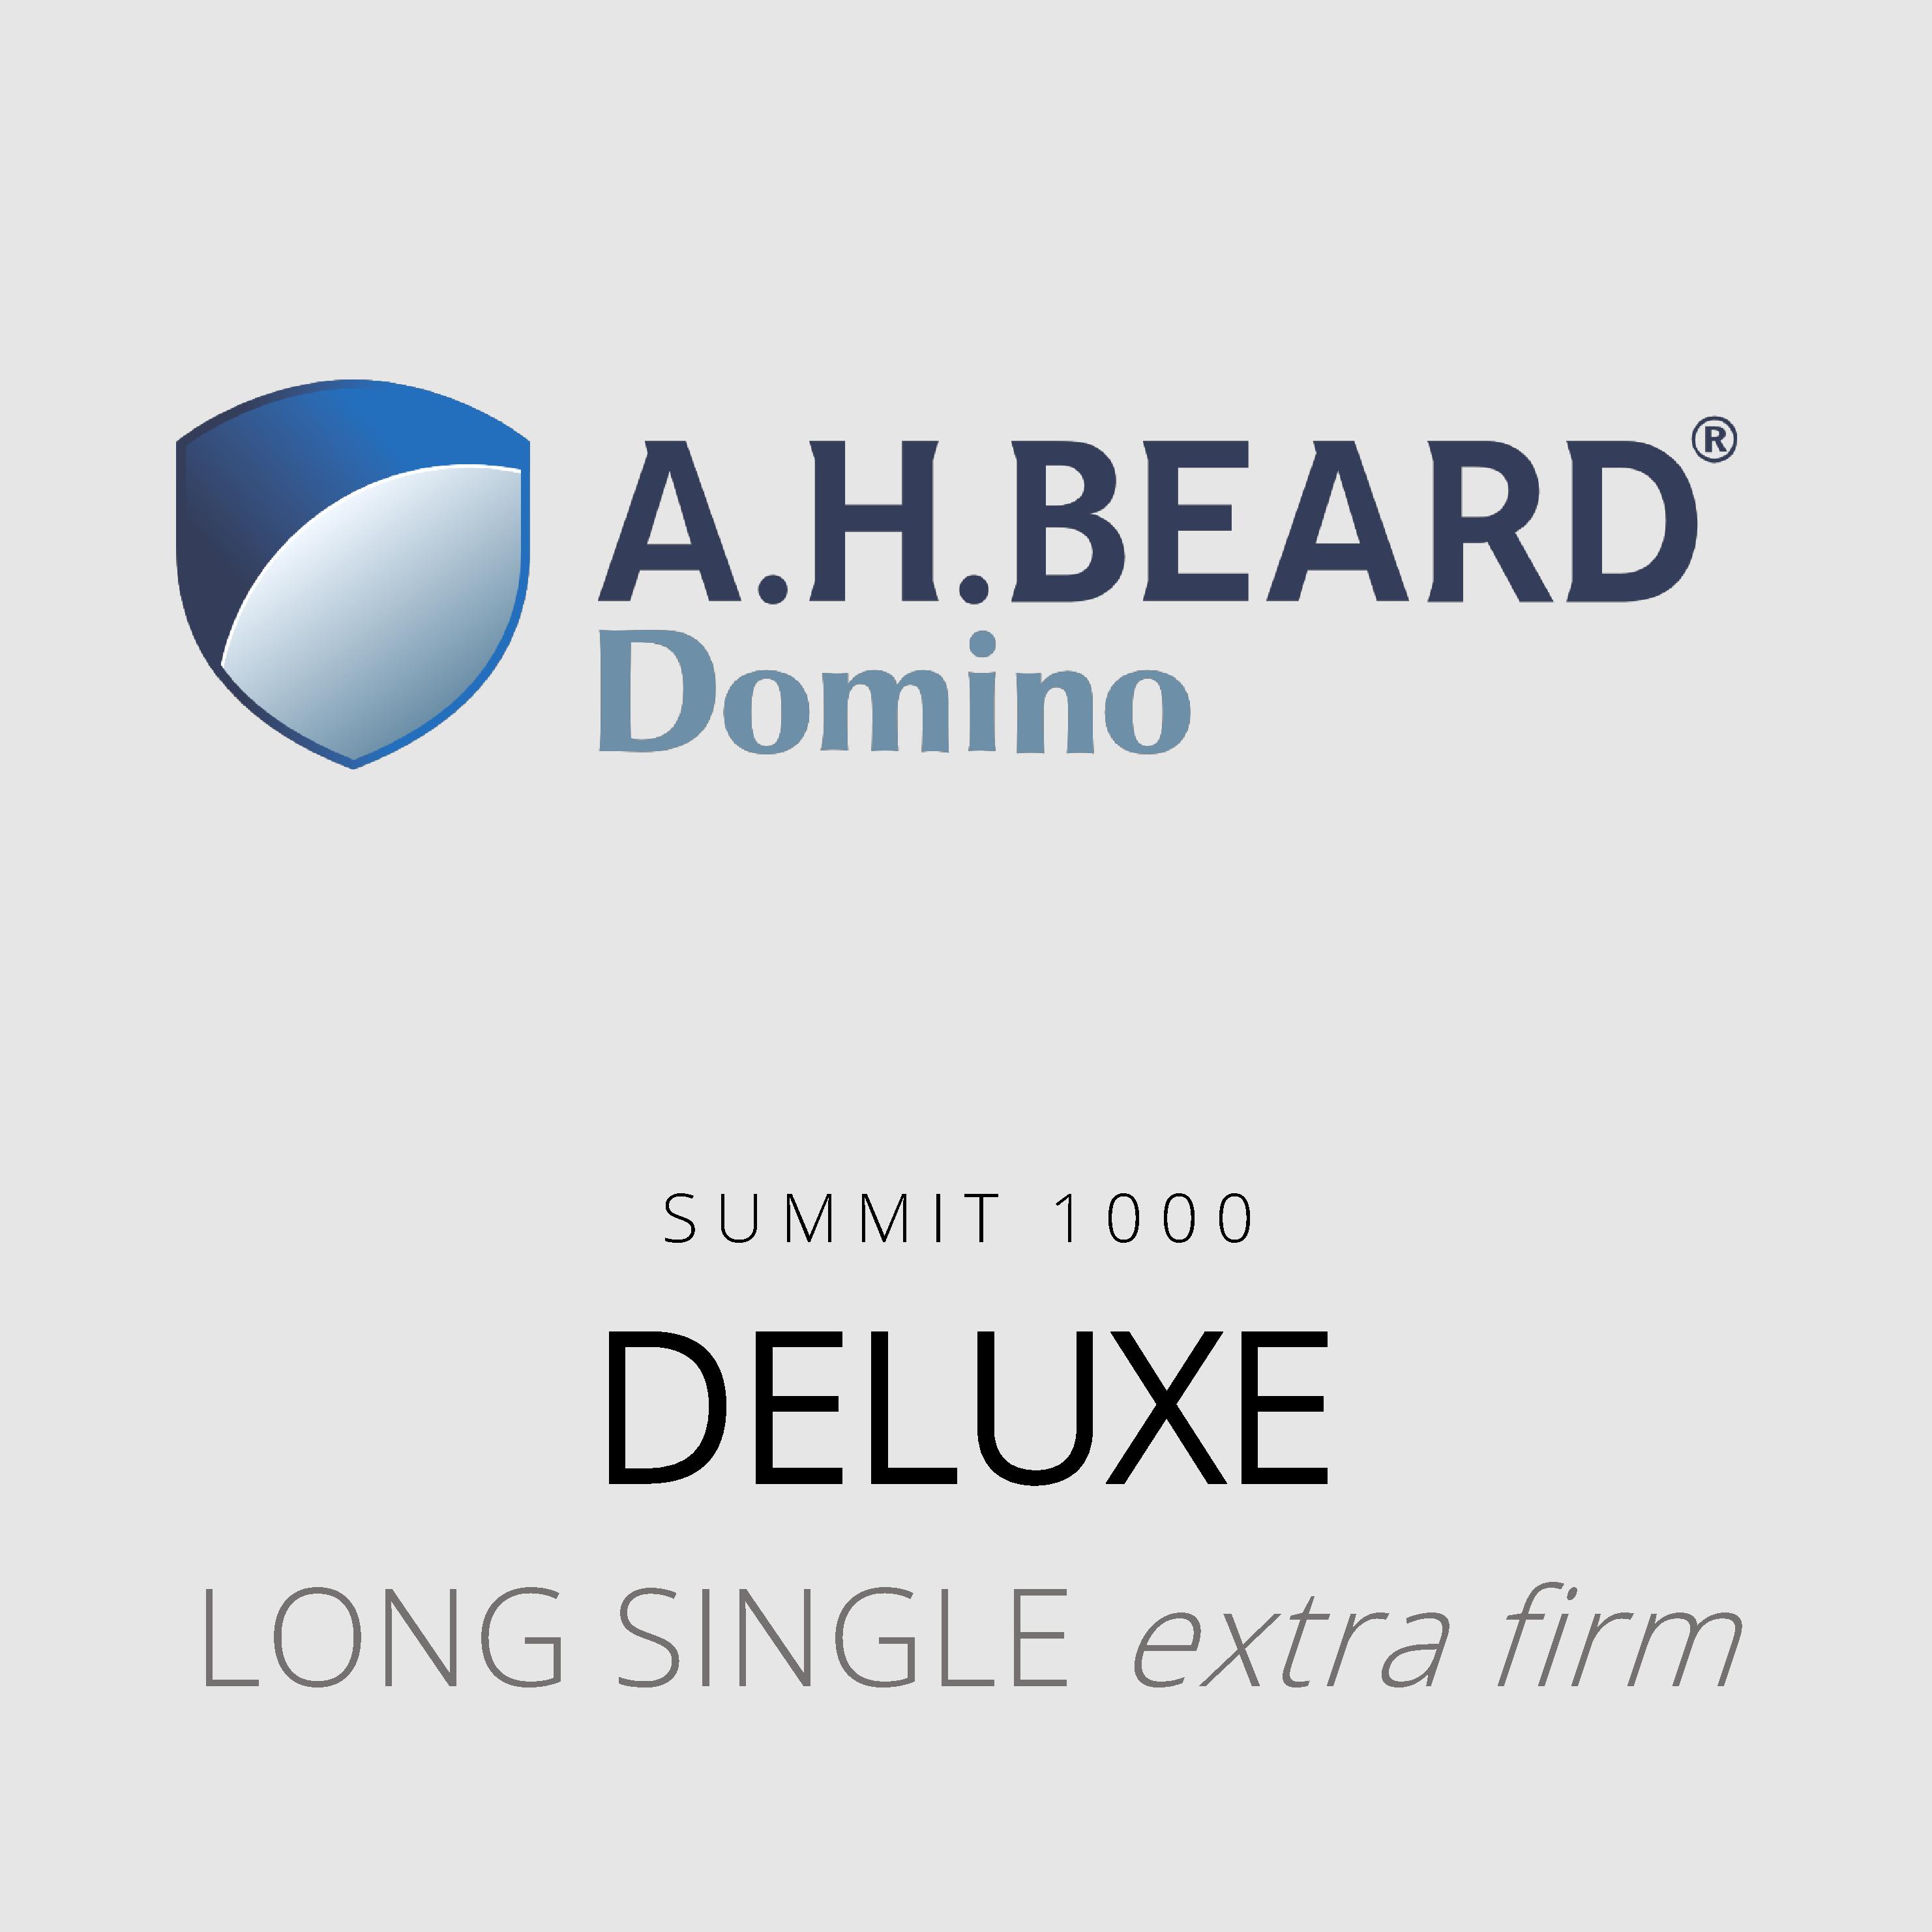 AH Beard Domino – Deluxe – Summit 1000 – Long Single Extra Firm Mattress